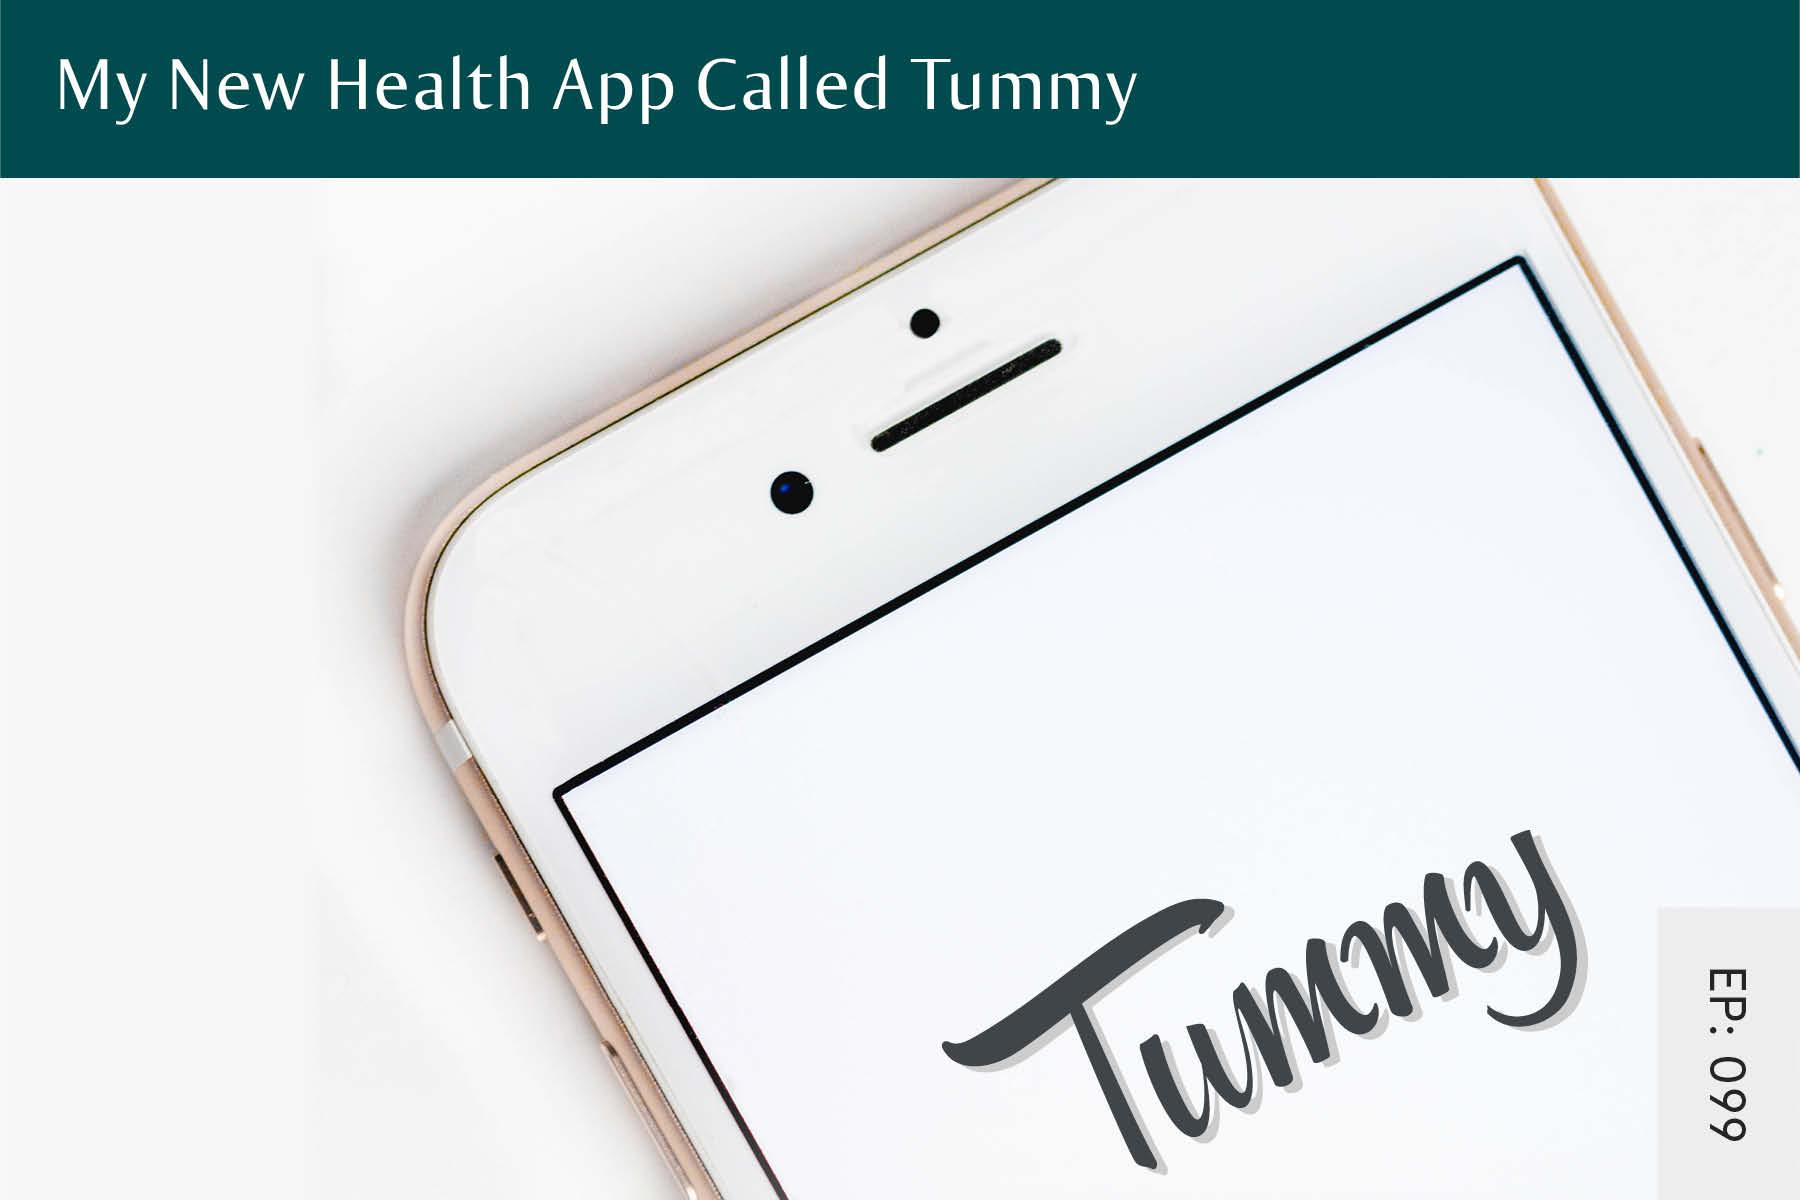 099: My New Health App Called Tummy